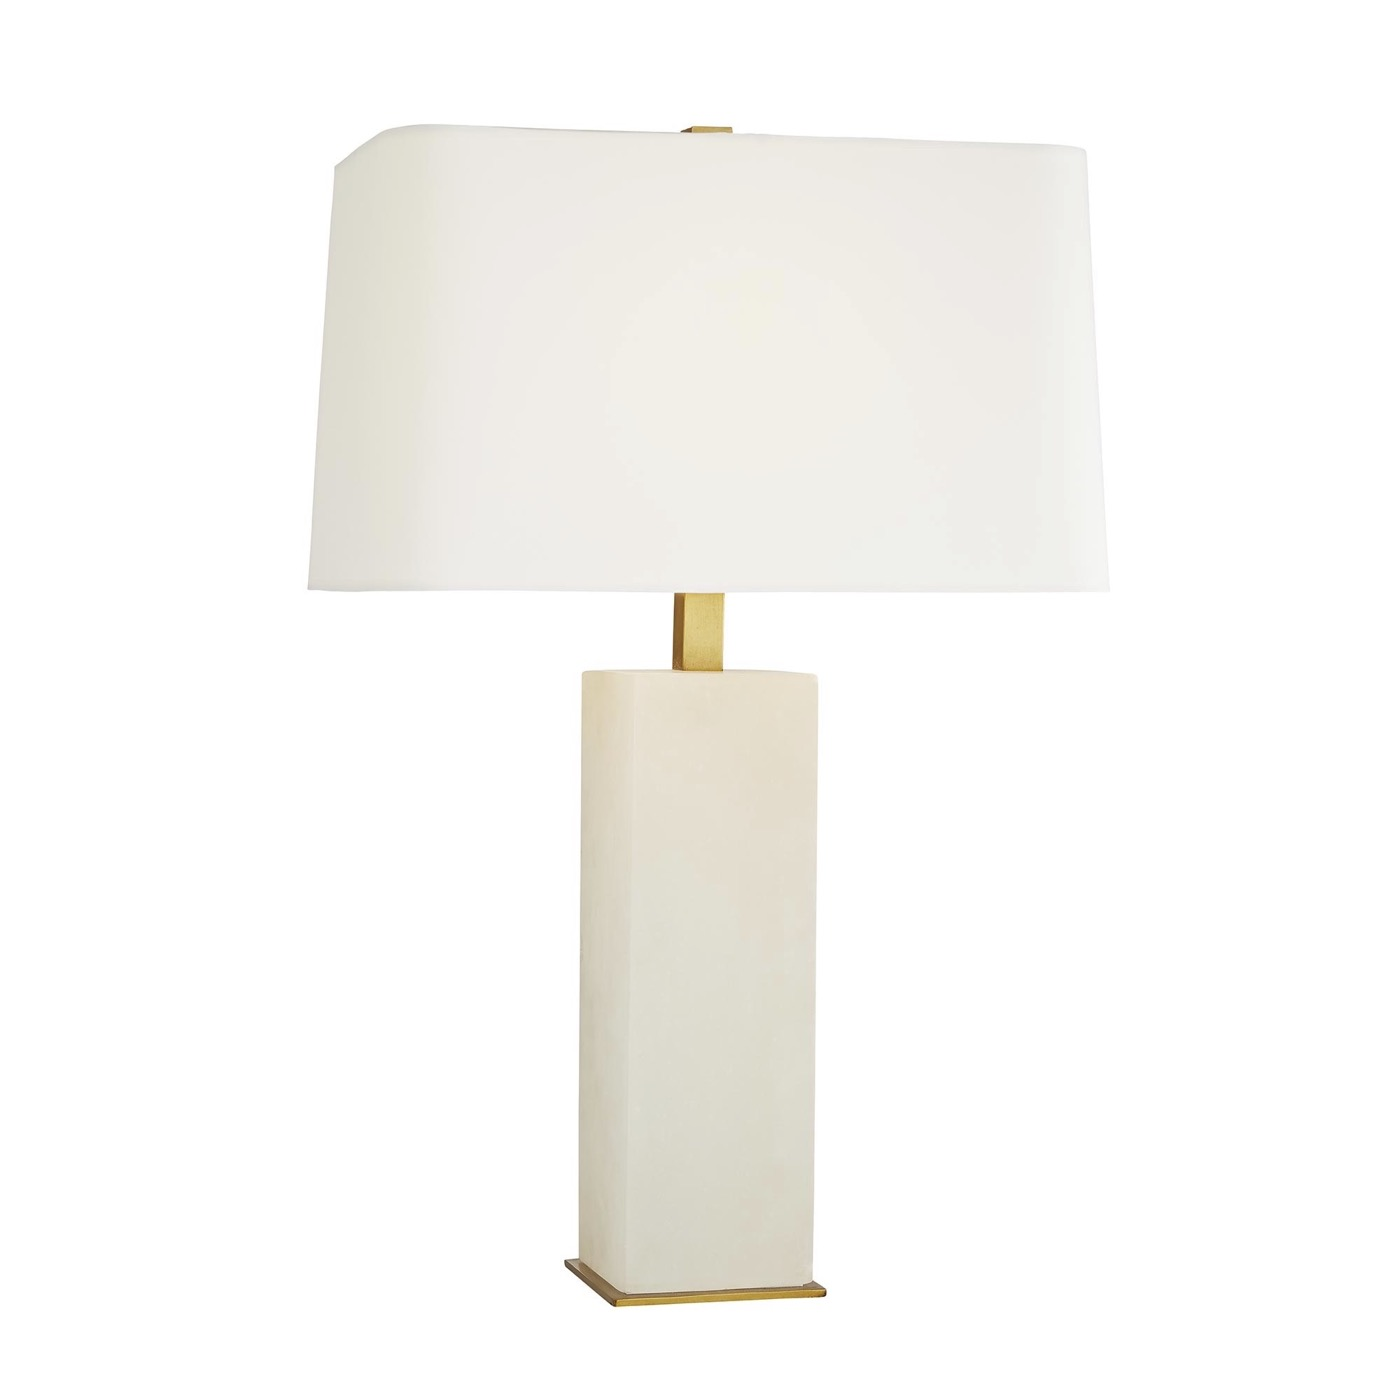 Turner Marble Table Lamp